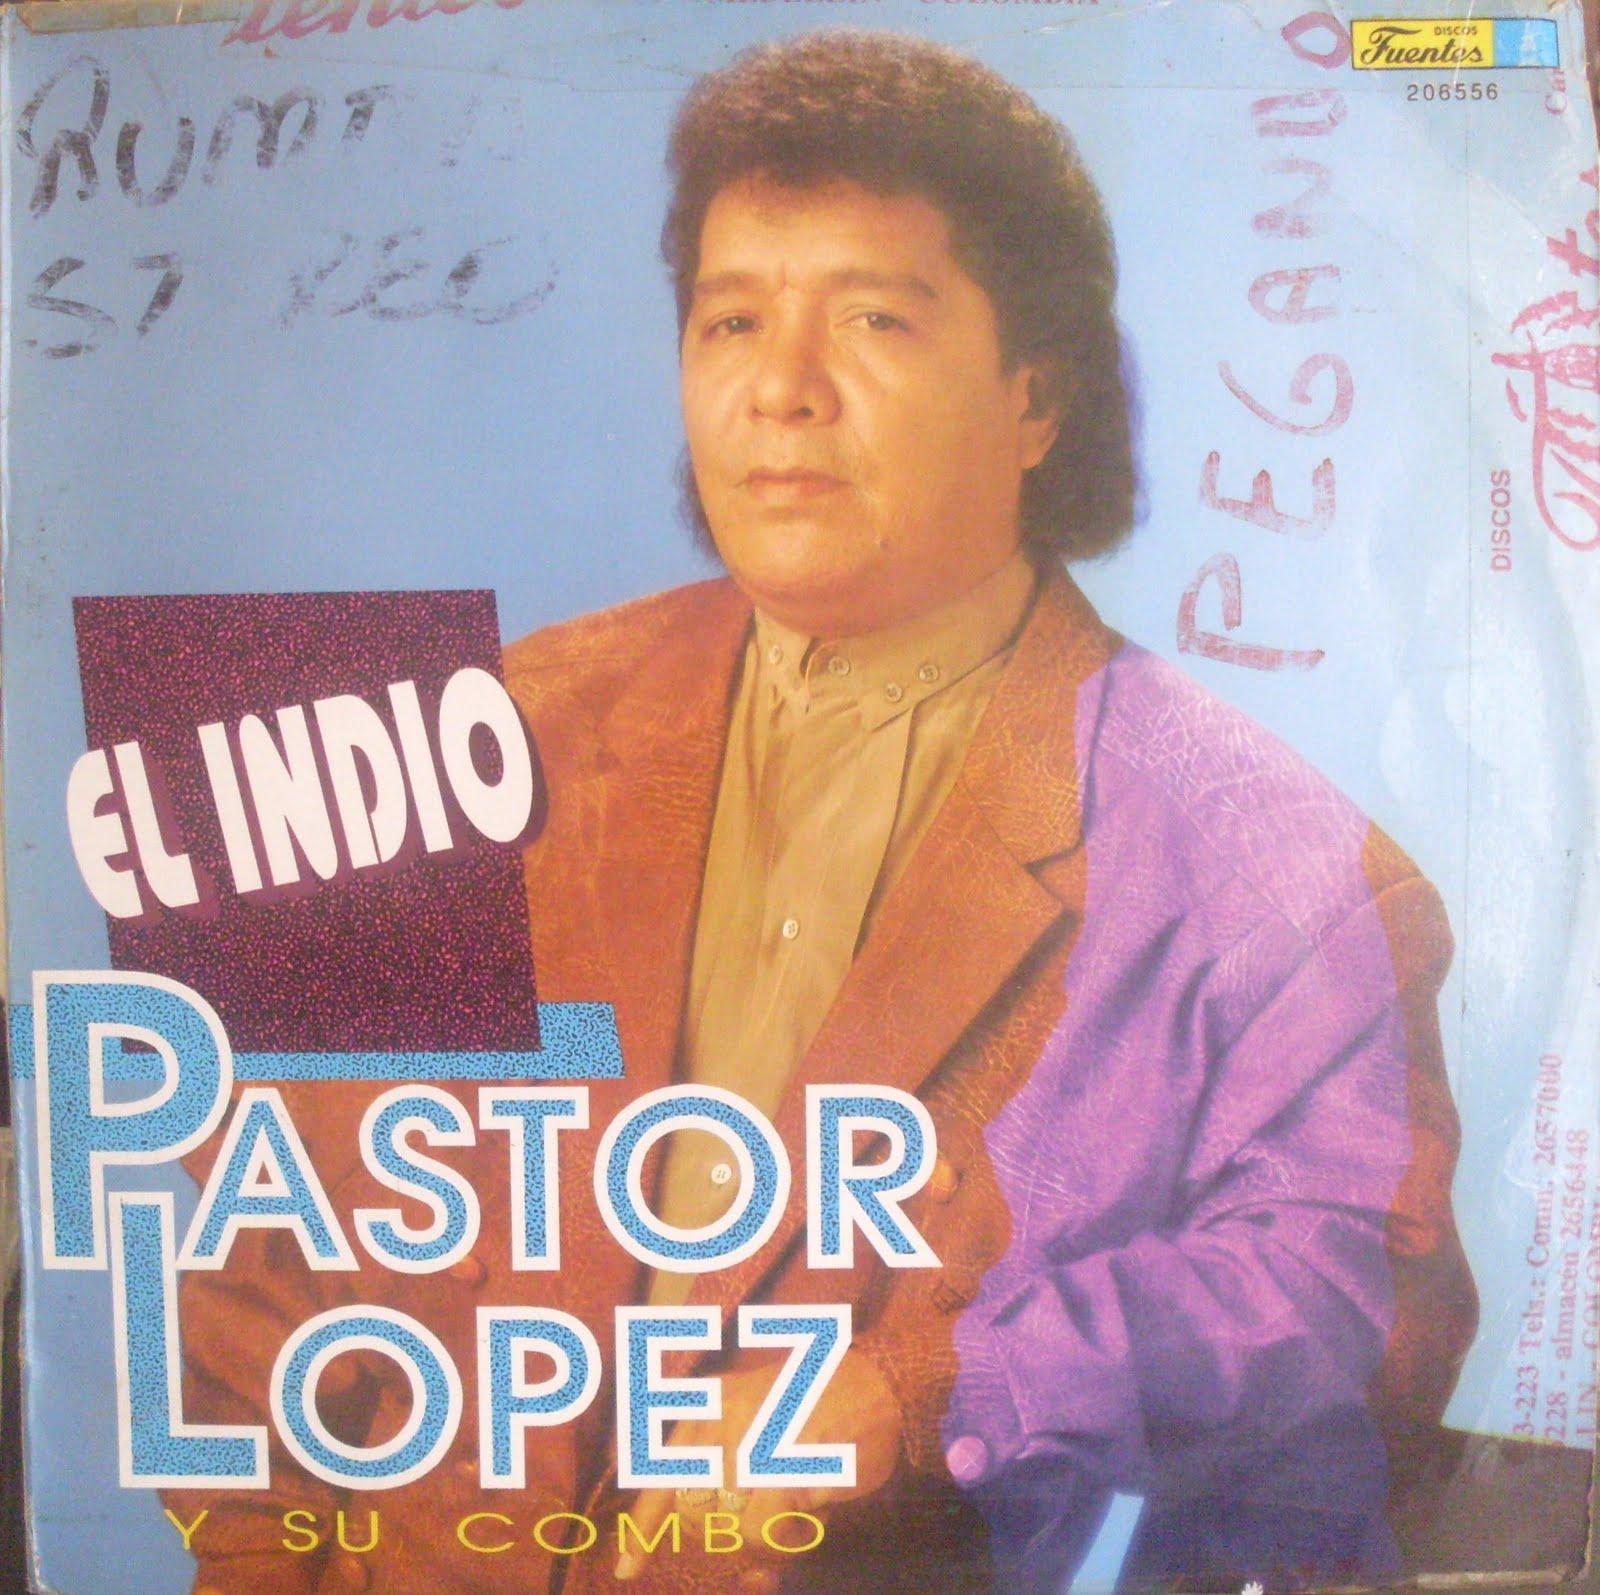 Ritmo Tropical Cumbia del Ayer: pastor lopez